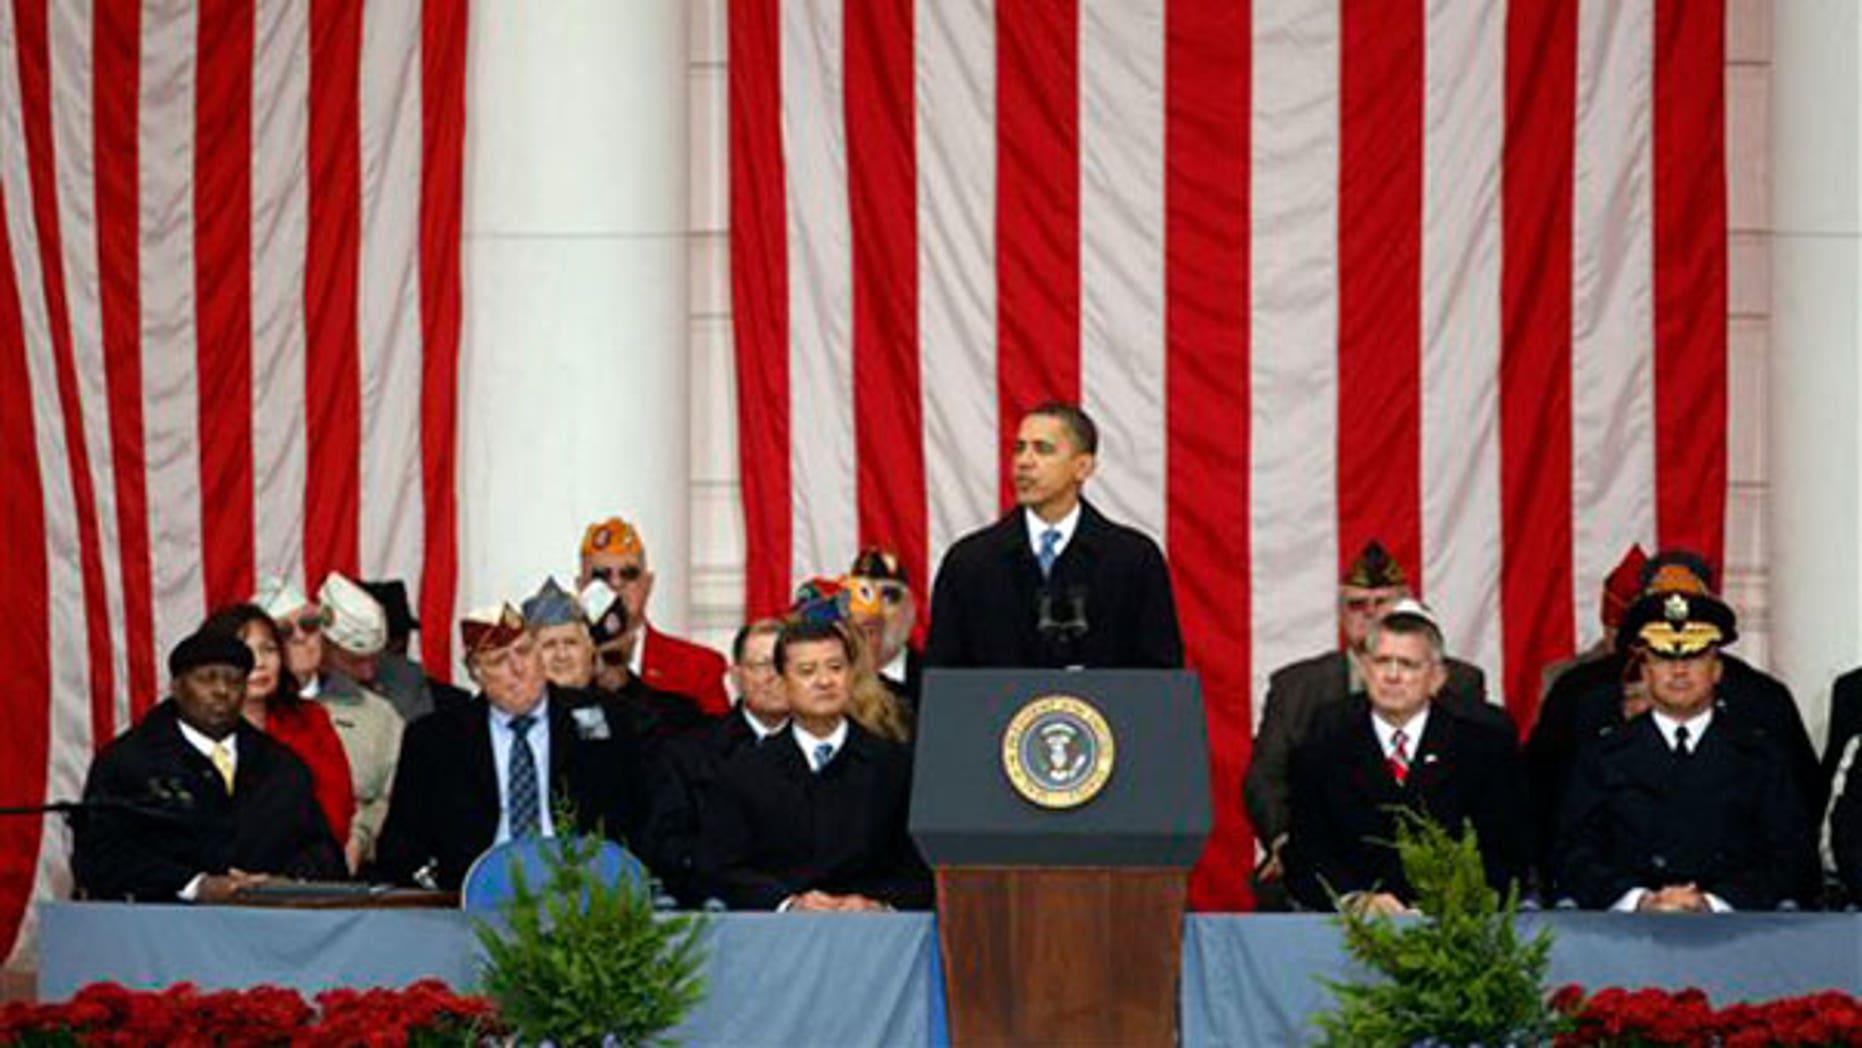 Nov. 11: President Obama speaks during the National Veterans Day Observance at Arlington National Cemetery in Arlington, Va. (AP).